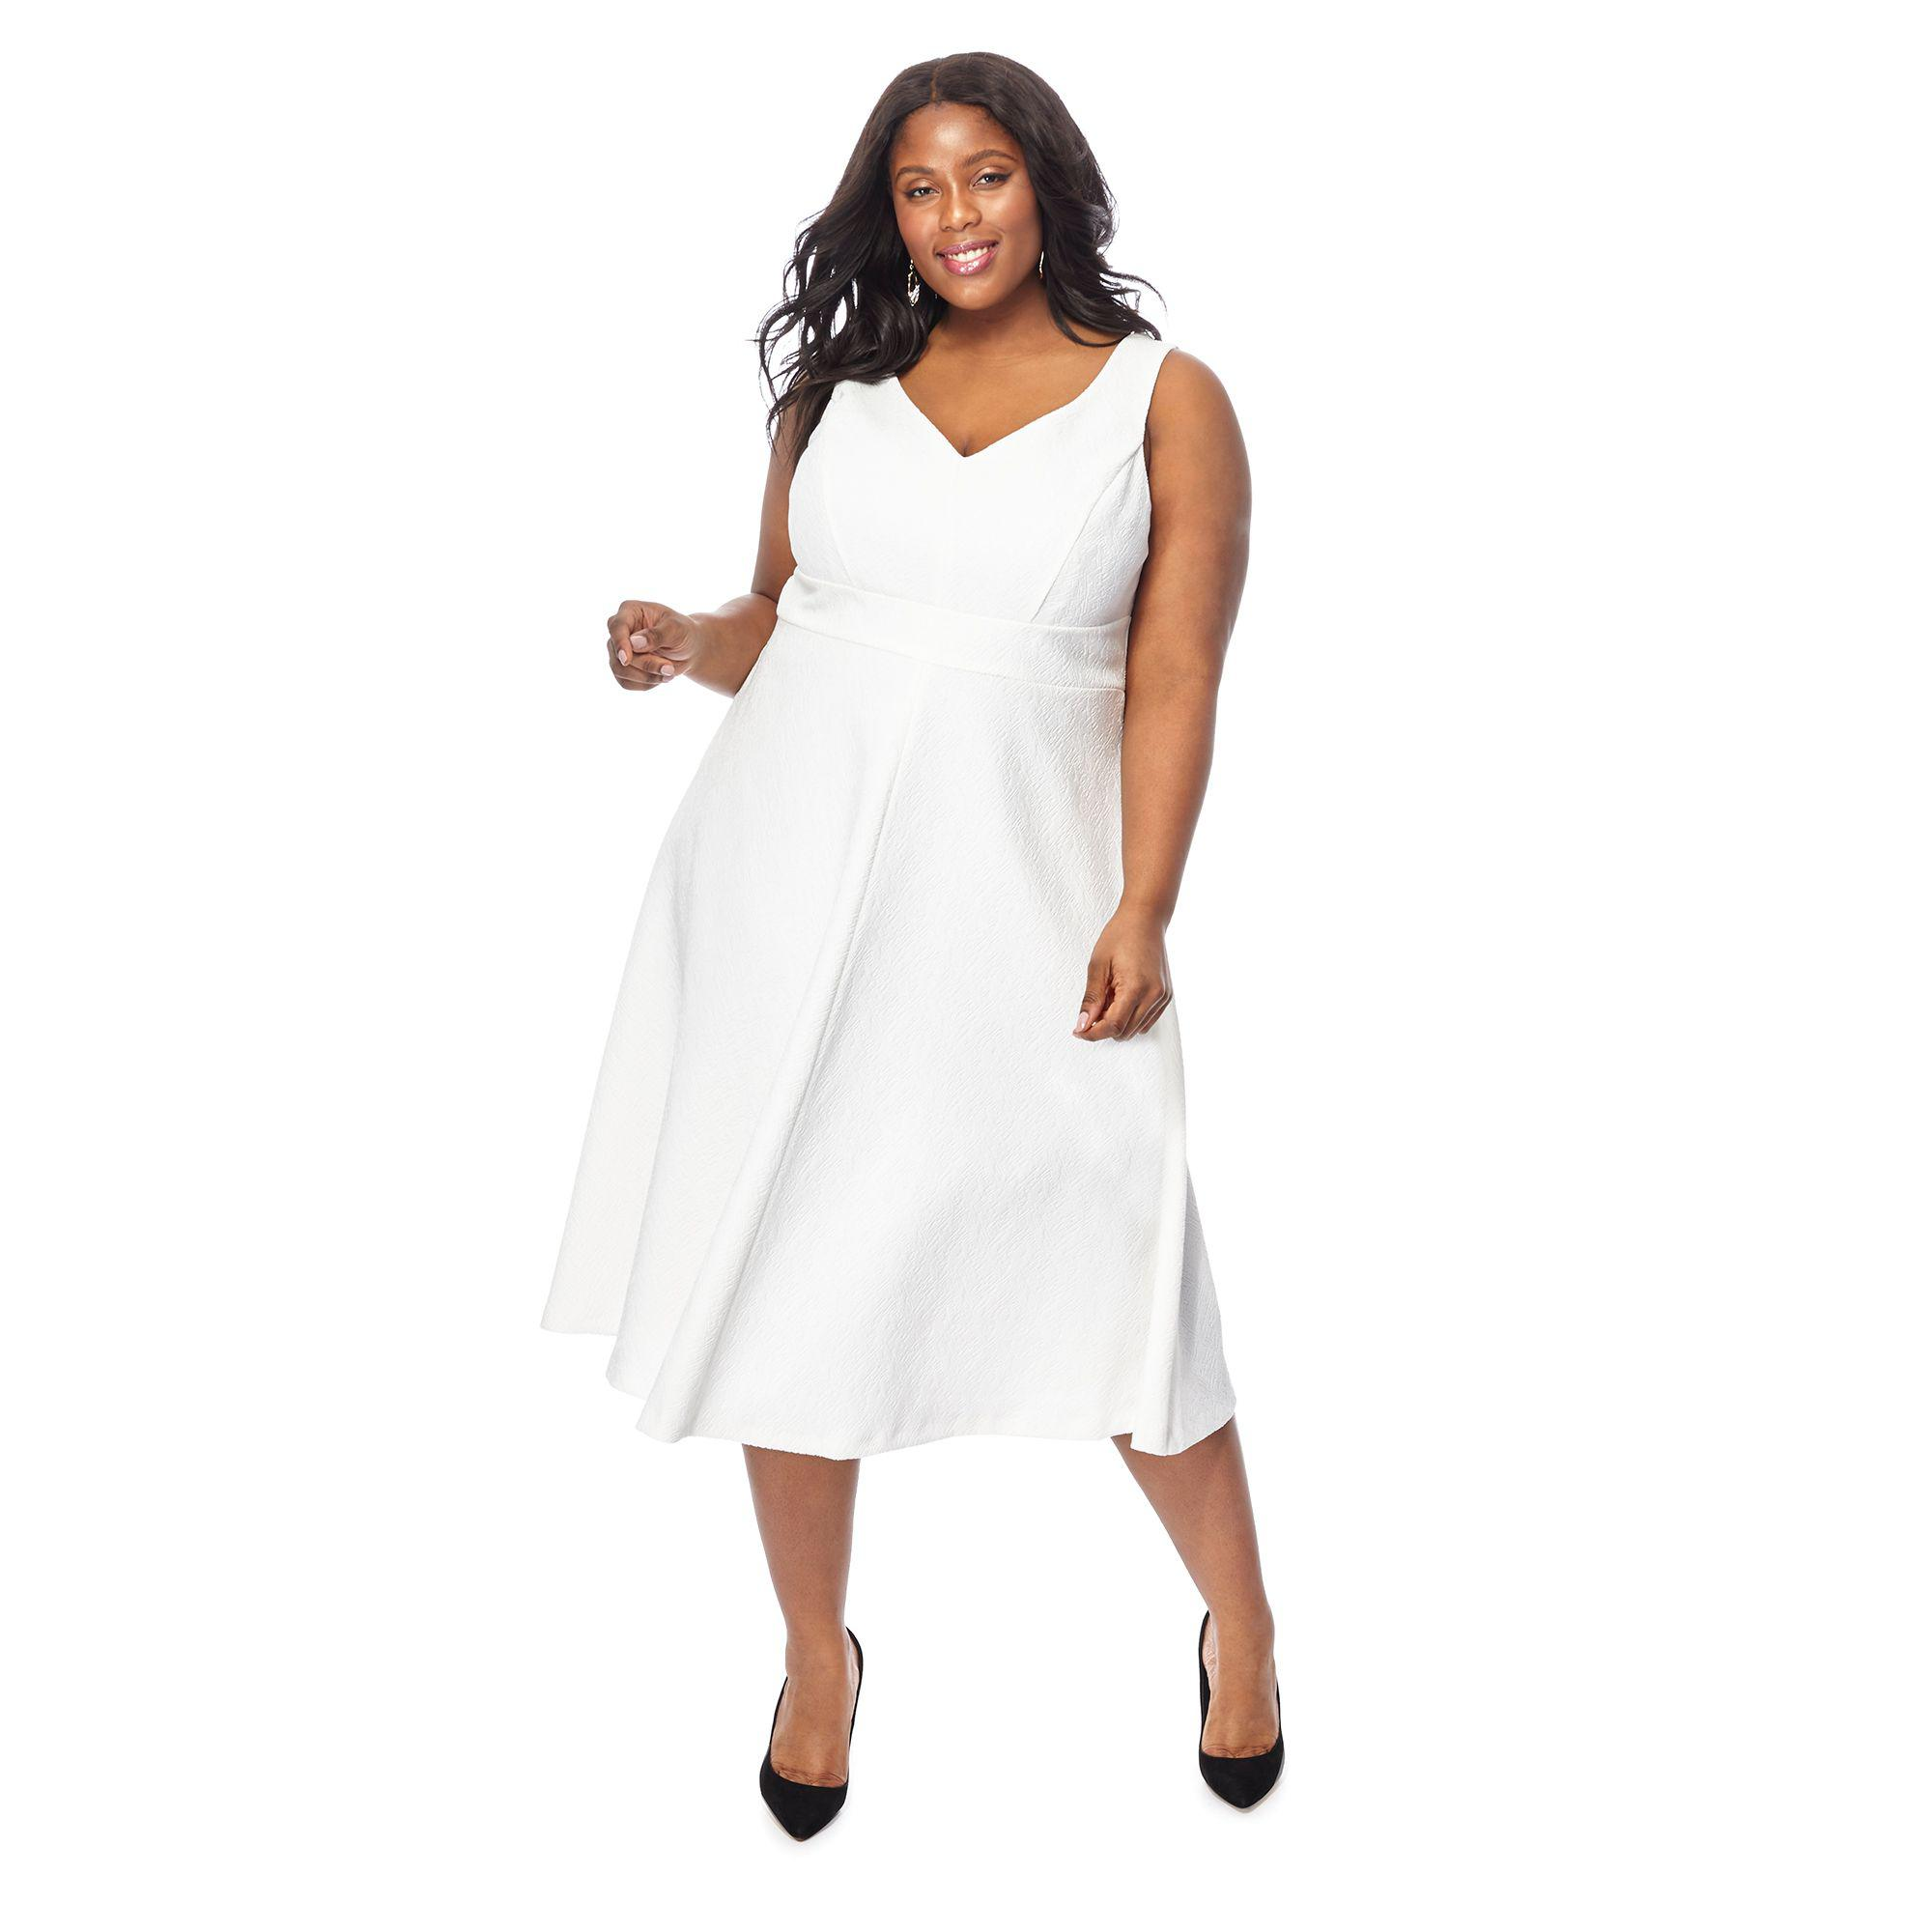 e718f7e6a78 Dresses - Chic And Curvy. New Plus Size ...